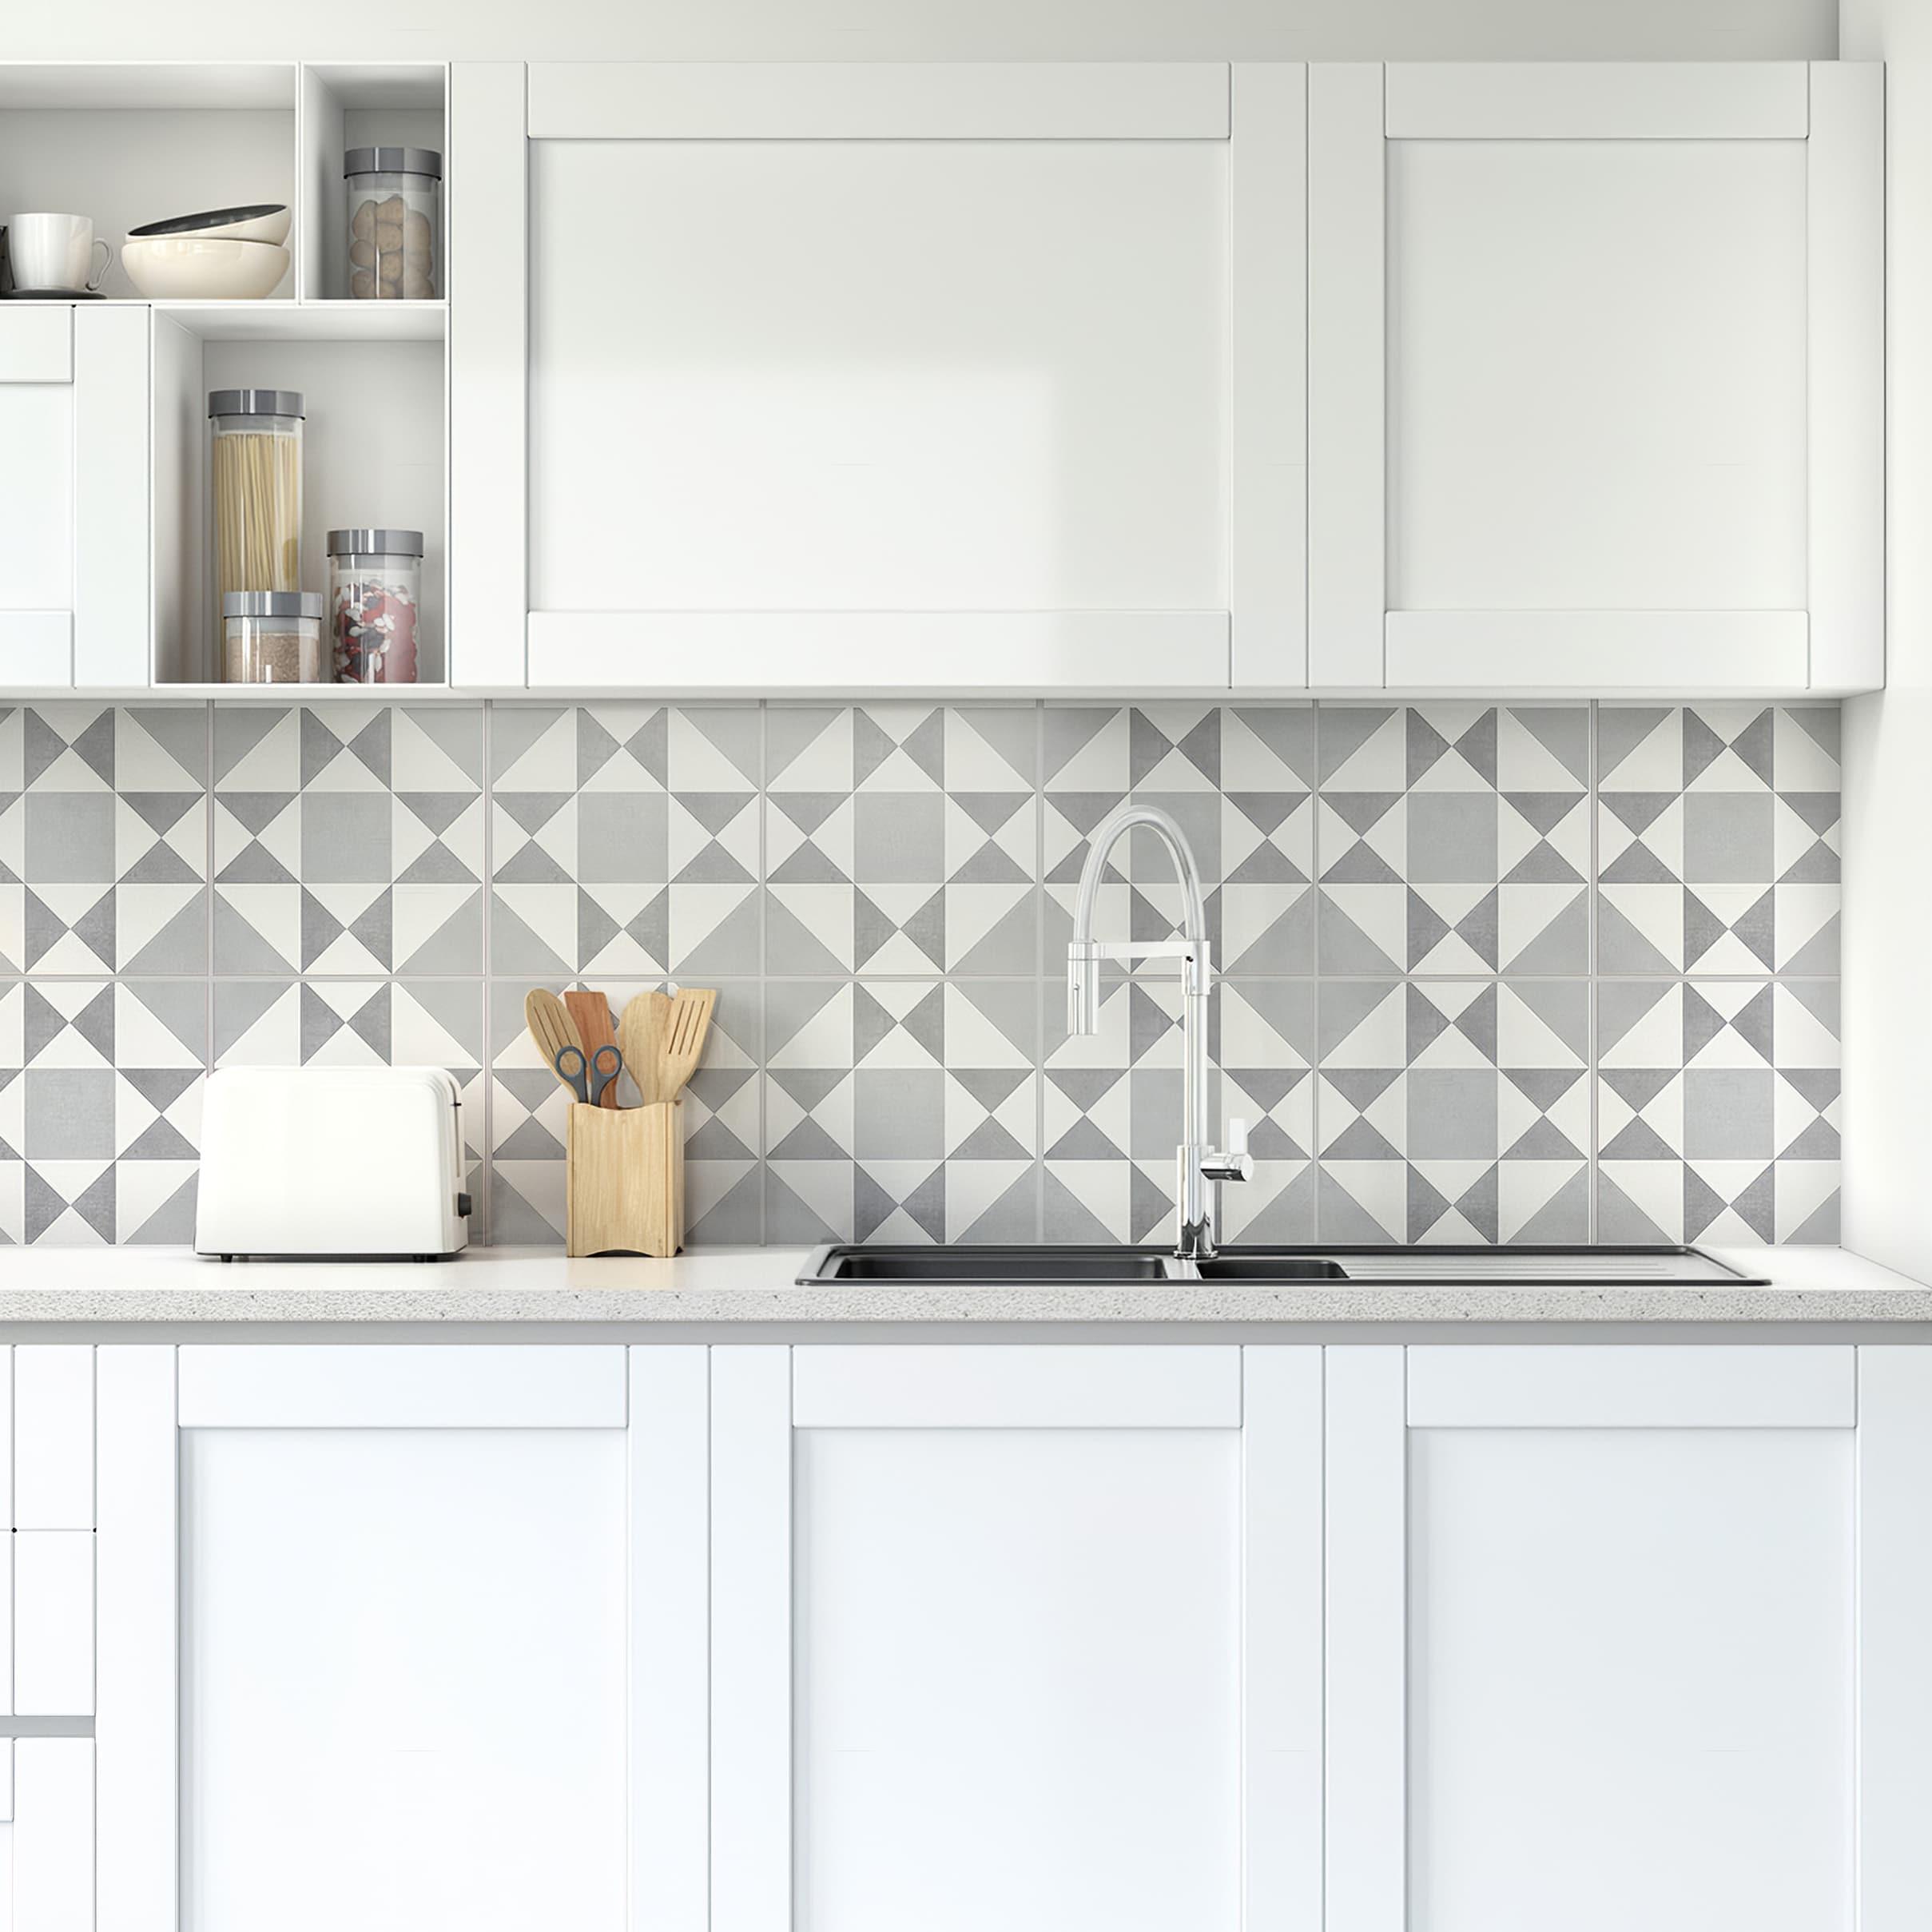 - Kitchen Backsplash Decor - Ohio Pattern Tiles - Moonwallstickers.com